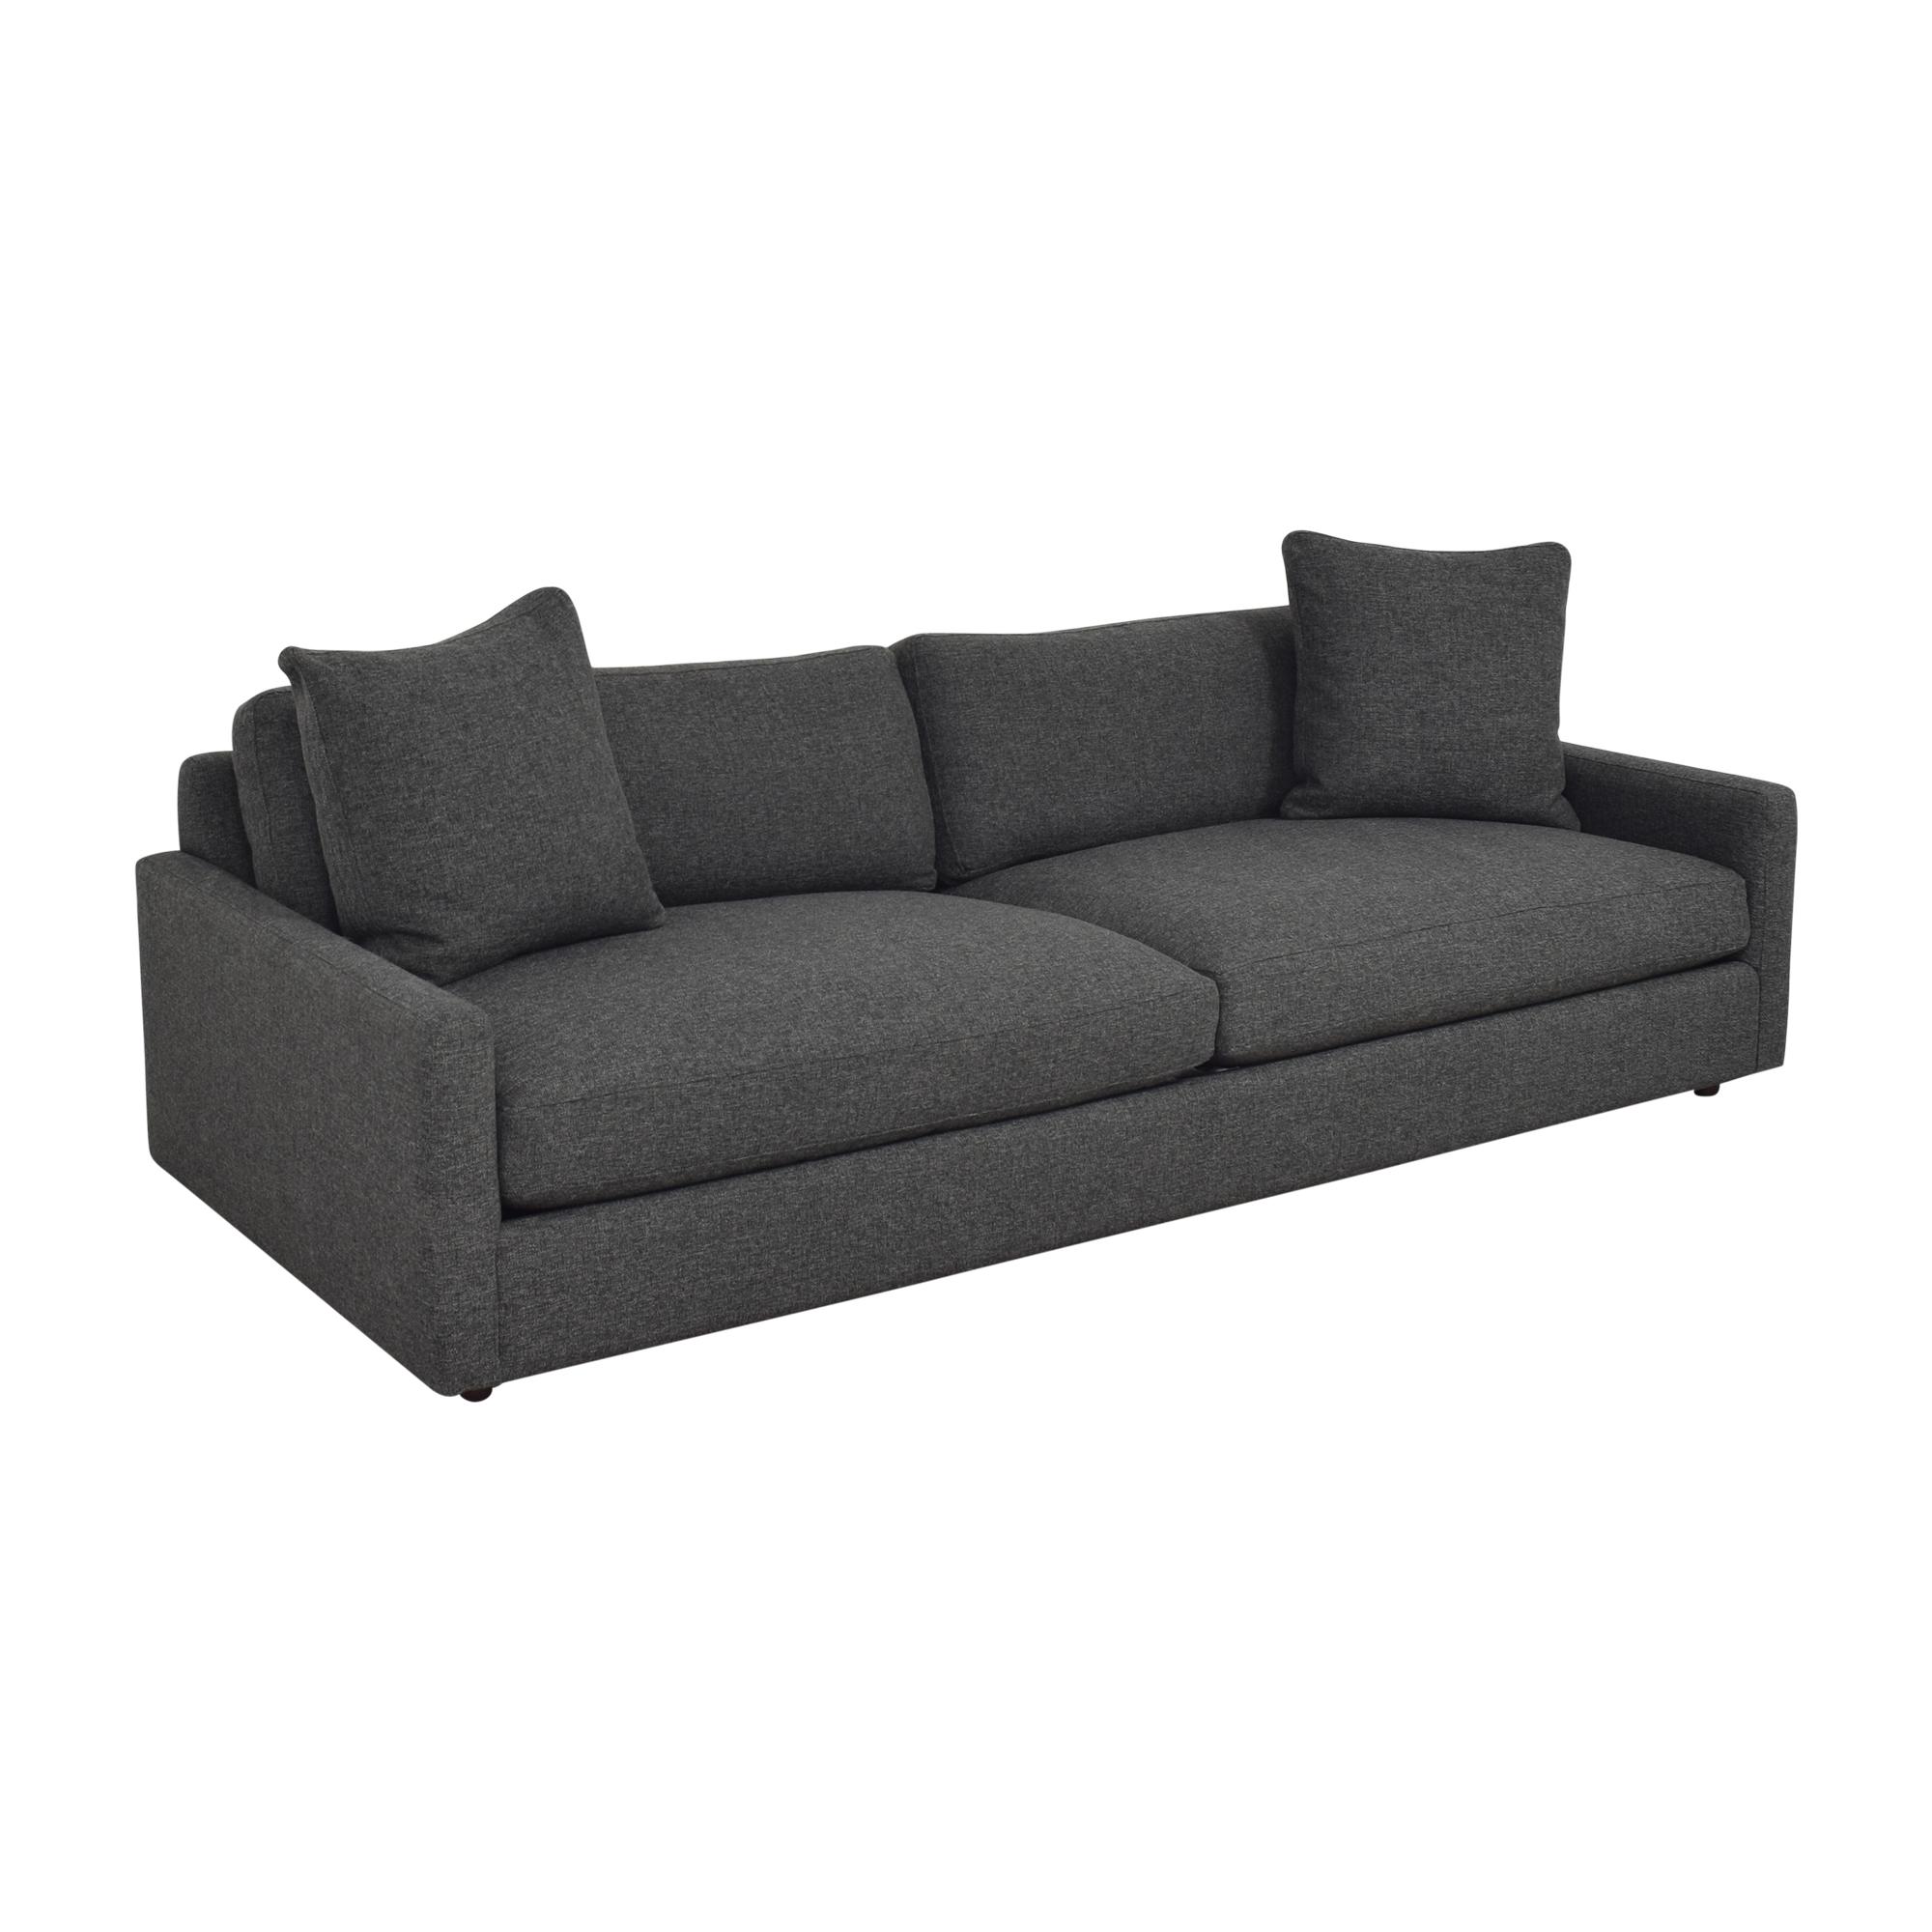 Room & Board Room & Board Easton Sofa pa